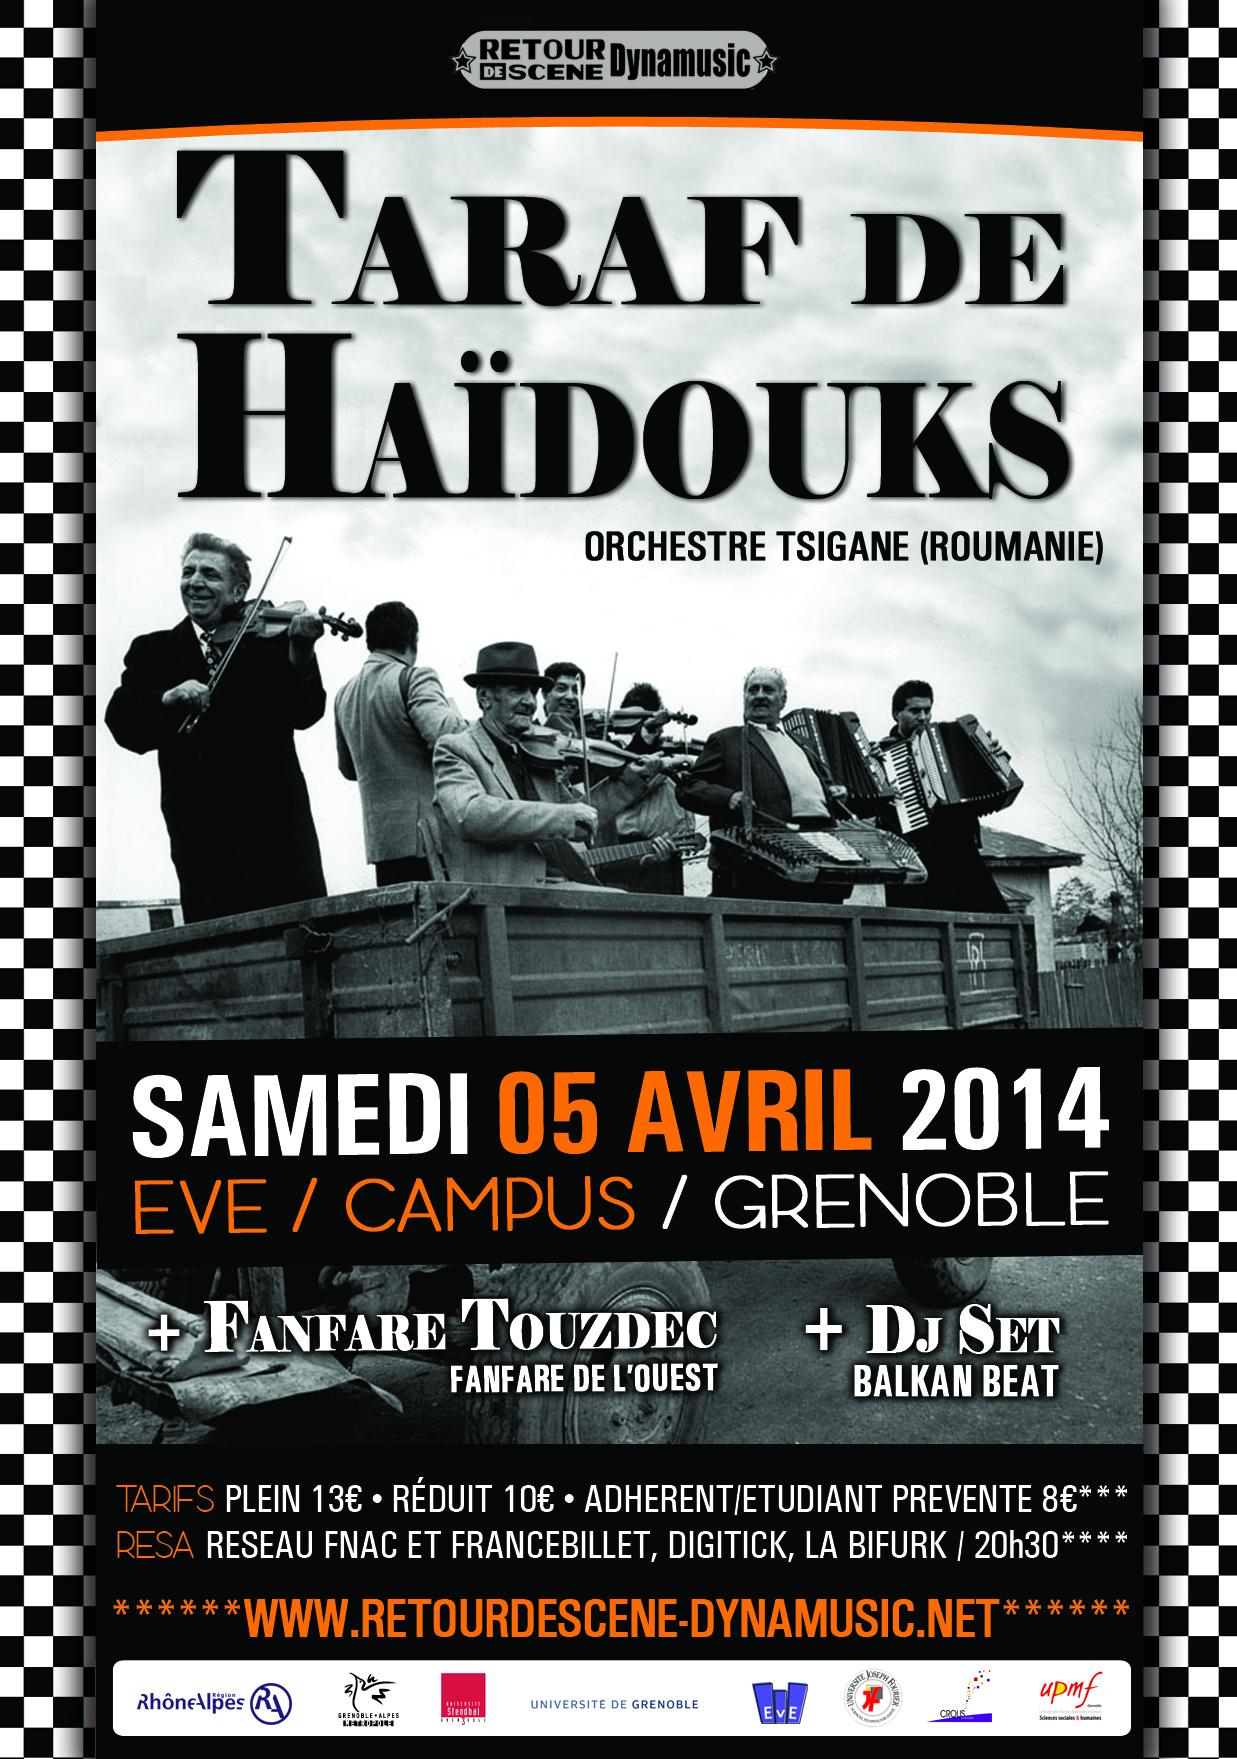 Taraf de Haïdoucks - EVE - 05/04/2014